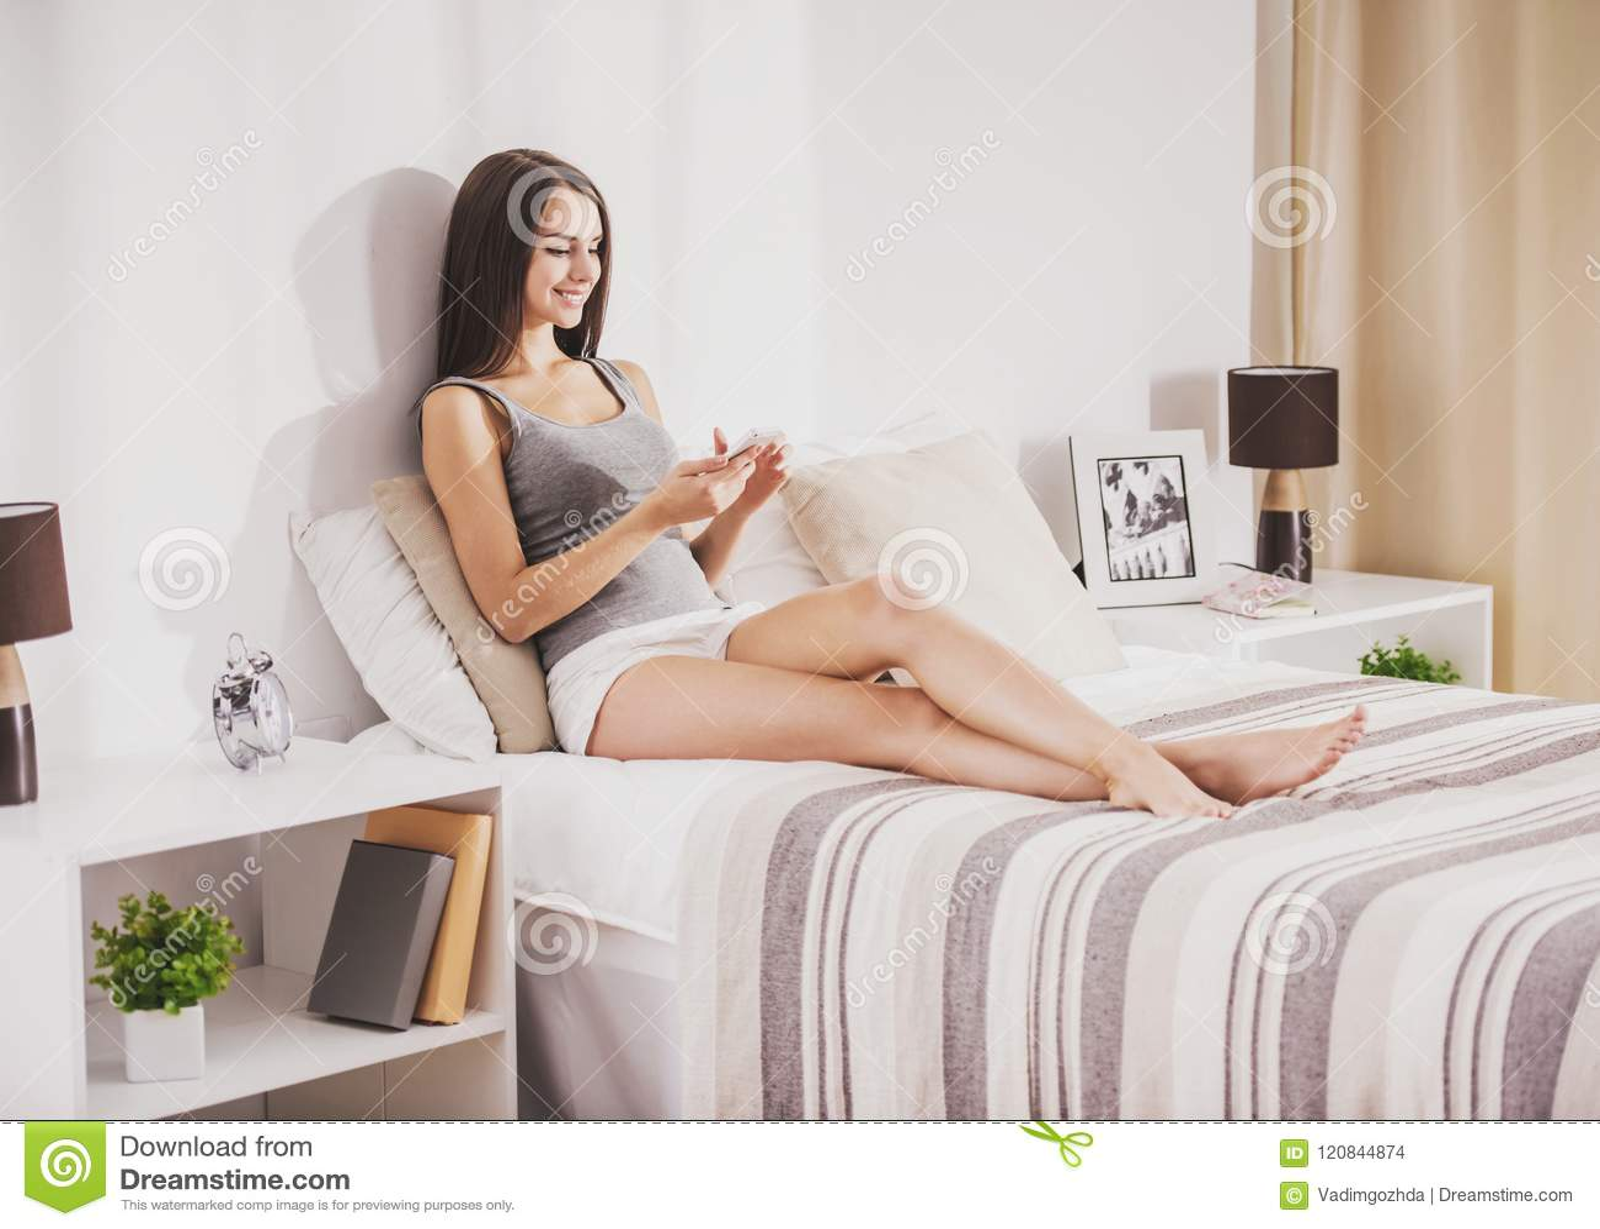 Фото девушек в джинсах на кровати ногами вверх, трахнул красивое спортивное тело смотреть онлайн